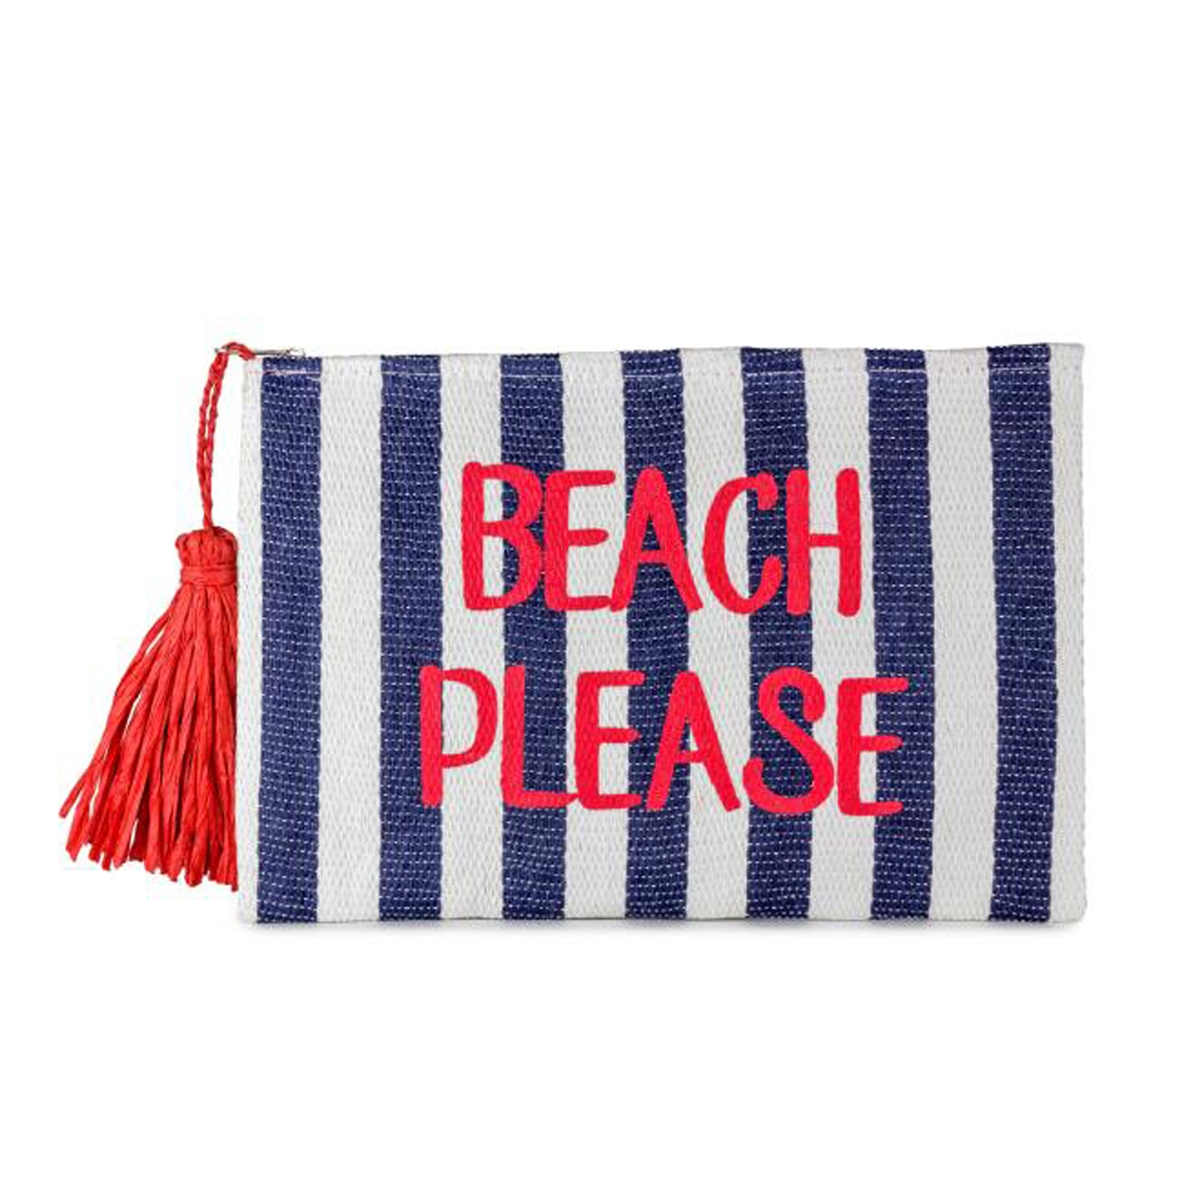 3e74d1bc67 Magid Beach Please Insulated Straw Clutch Swimwear Bag, Navy ...